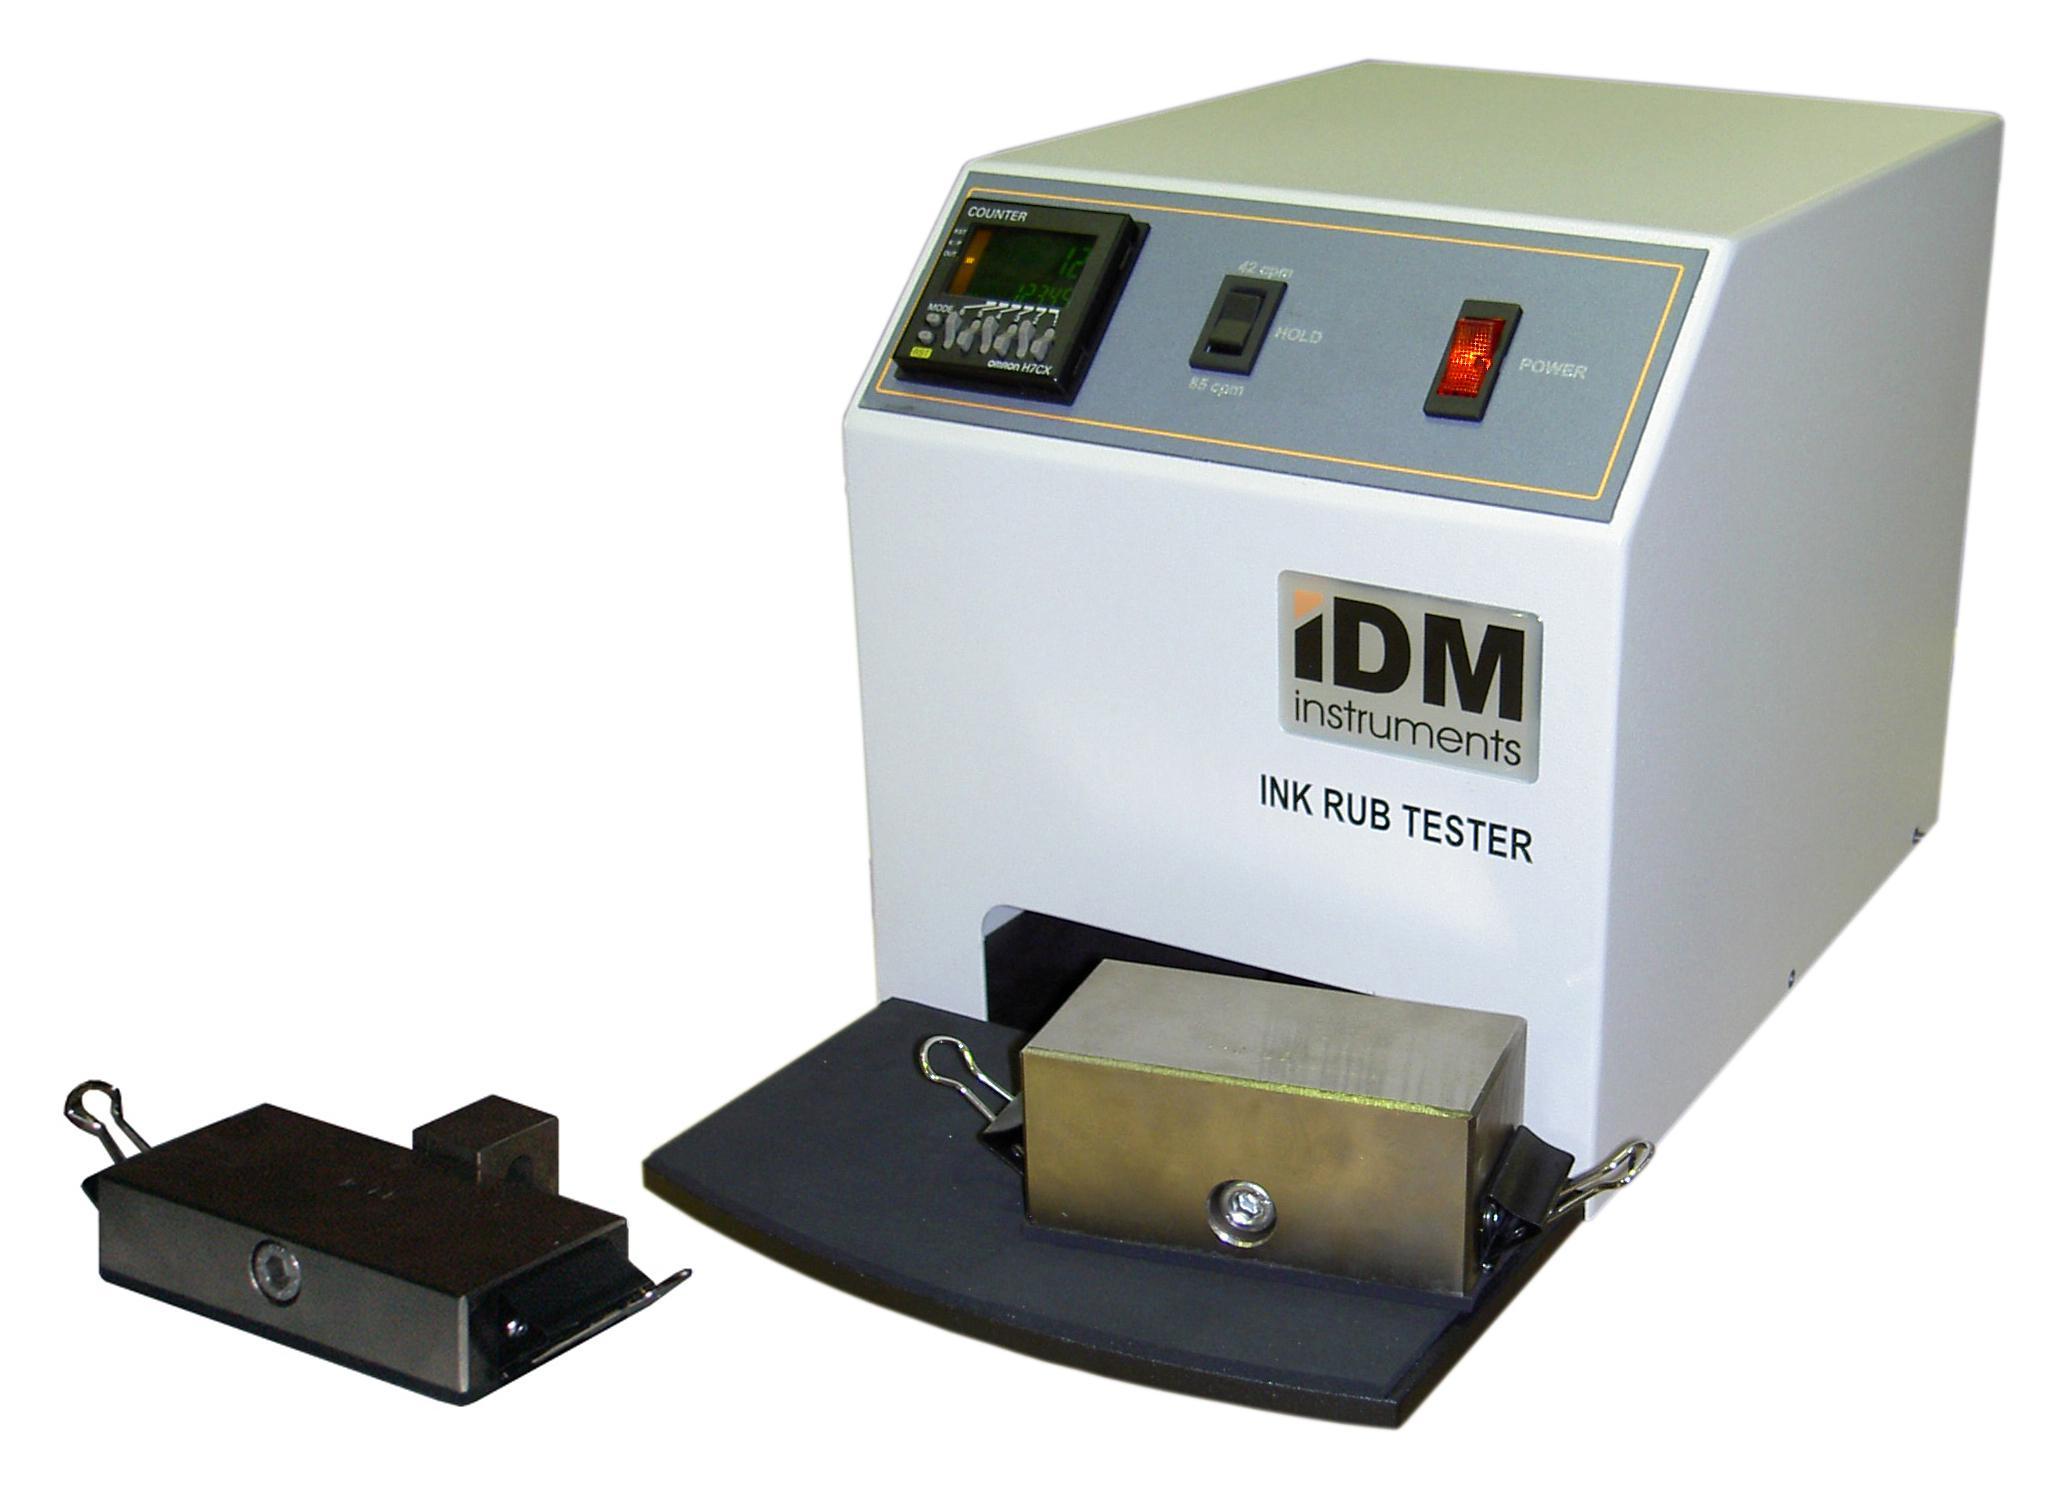 I0001 – Ink Rub Tester